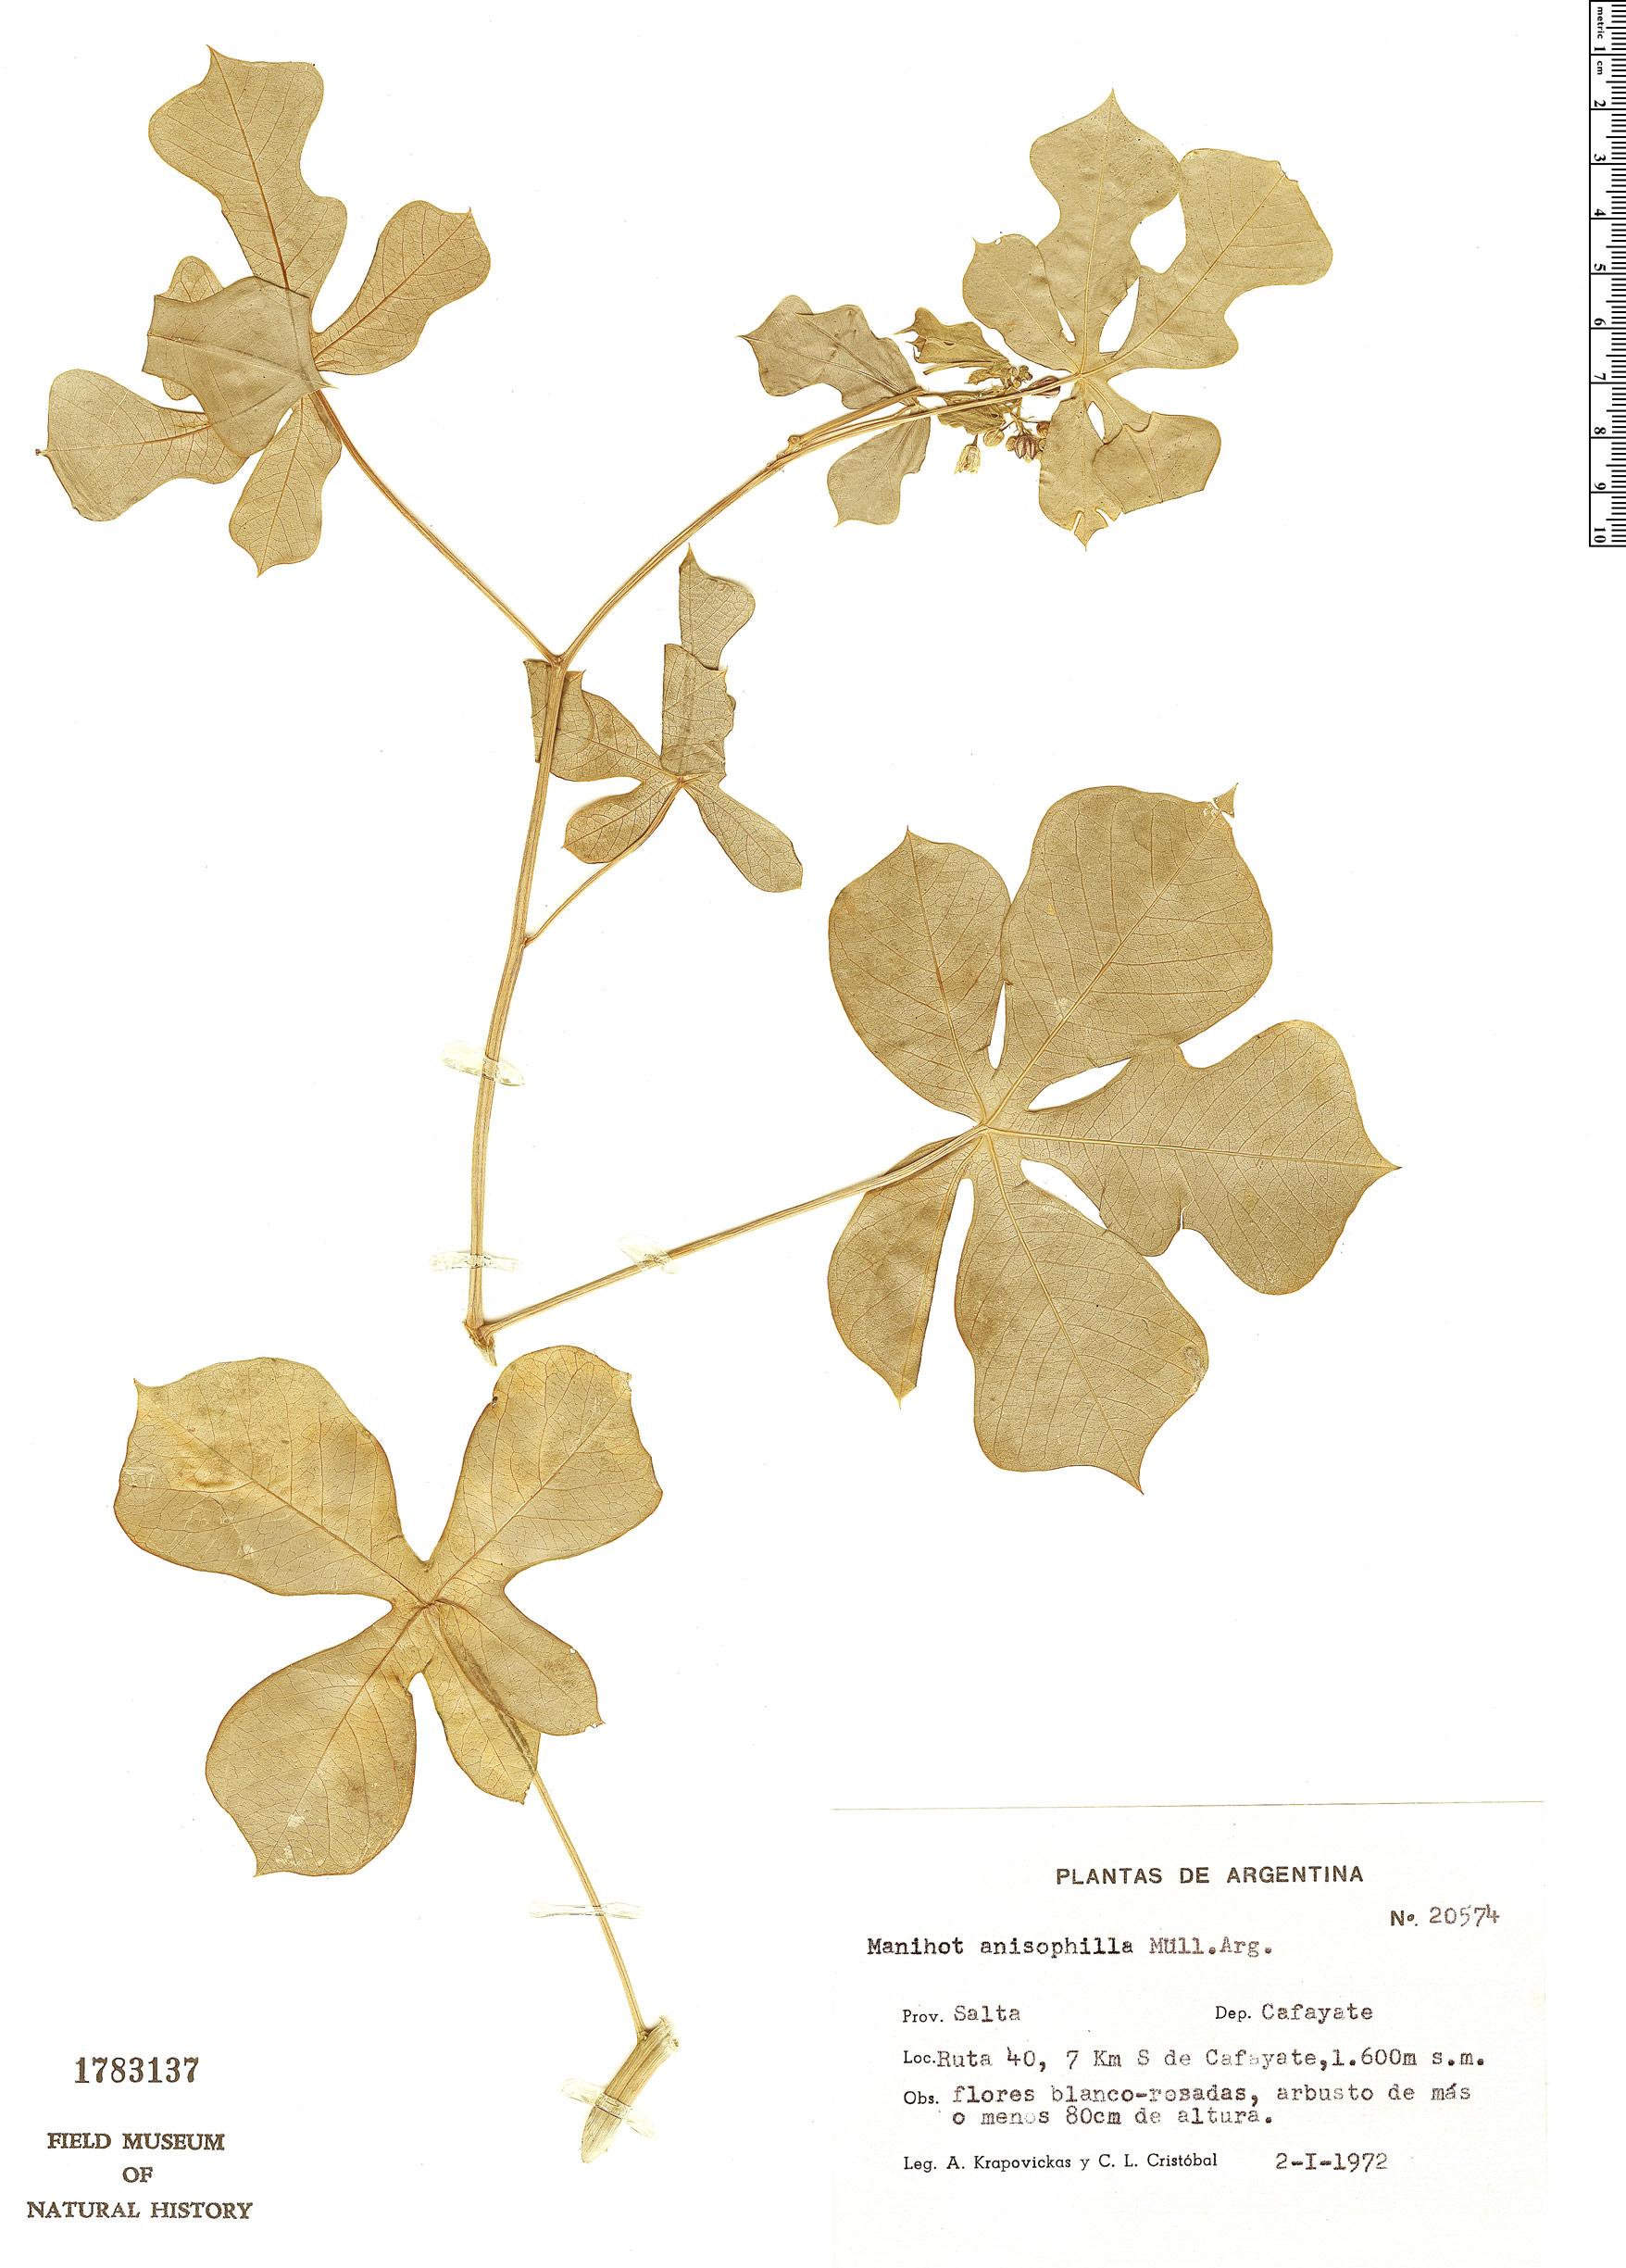 Specimen: Manihot anisophylla